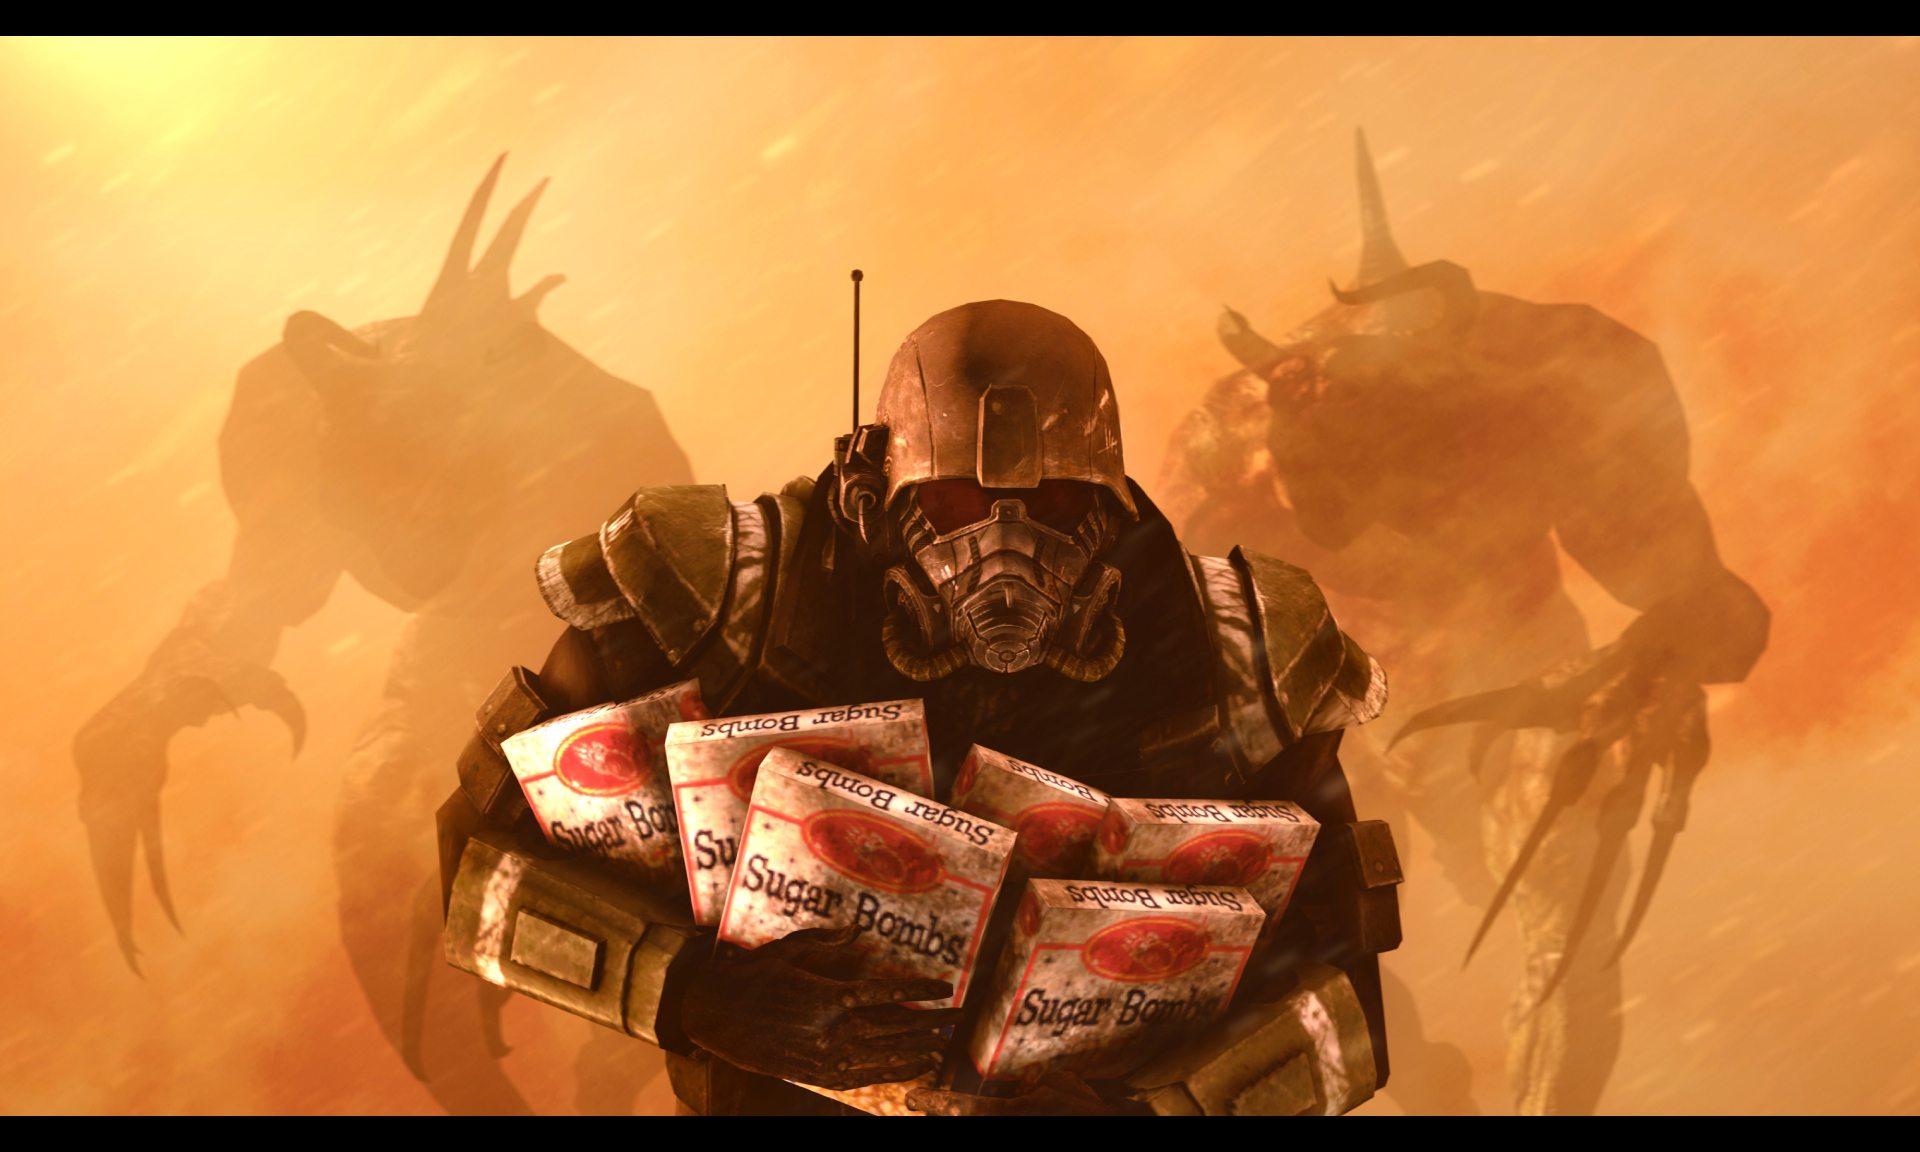 Fallout-Игры-art-красивые-картинки-1015660